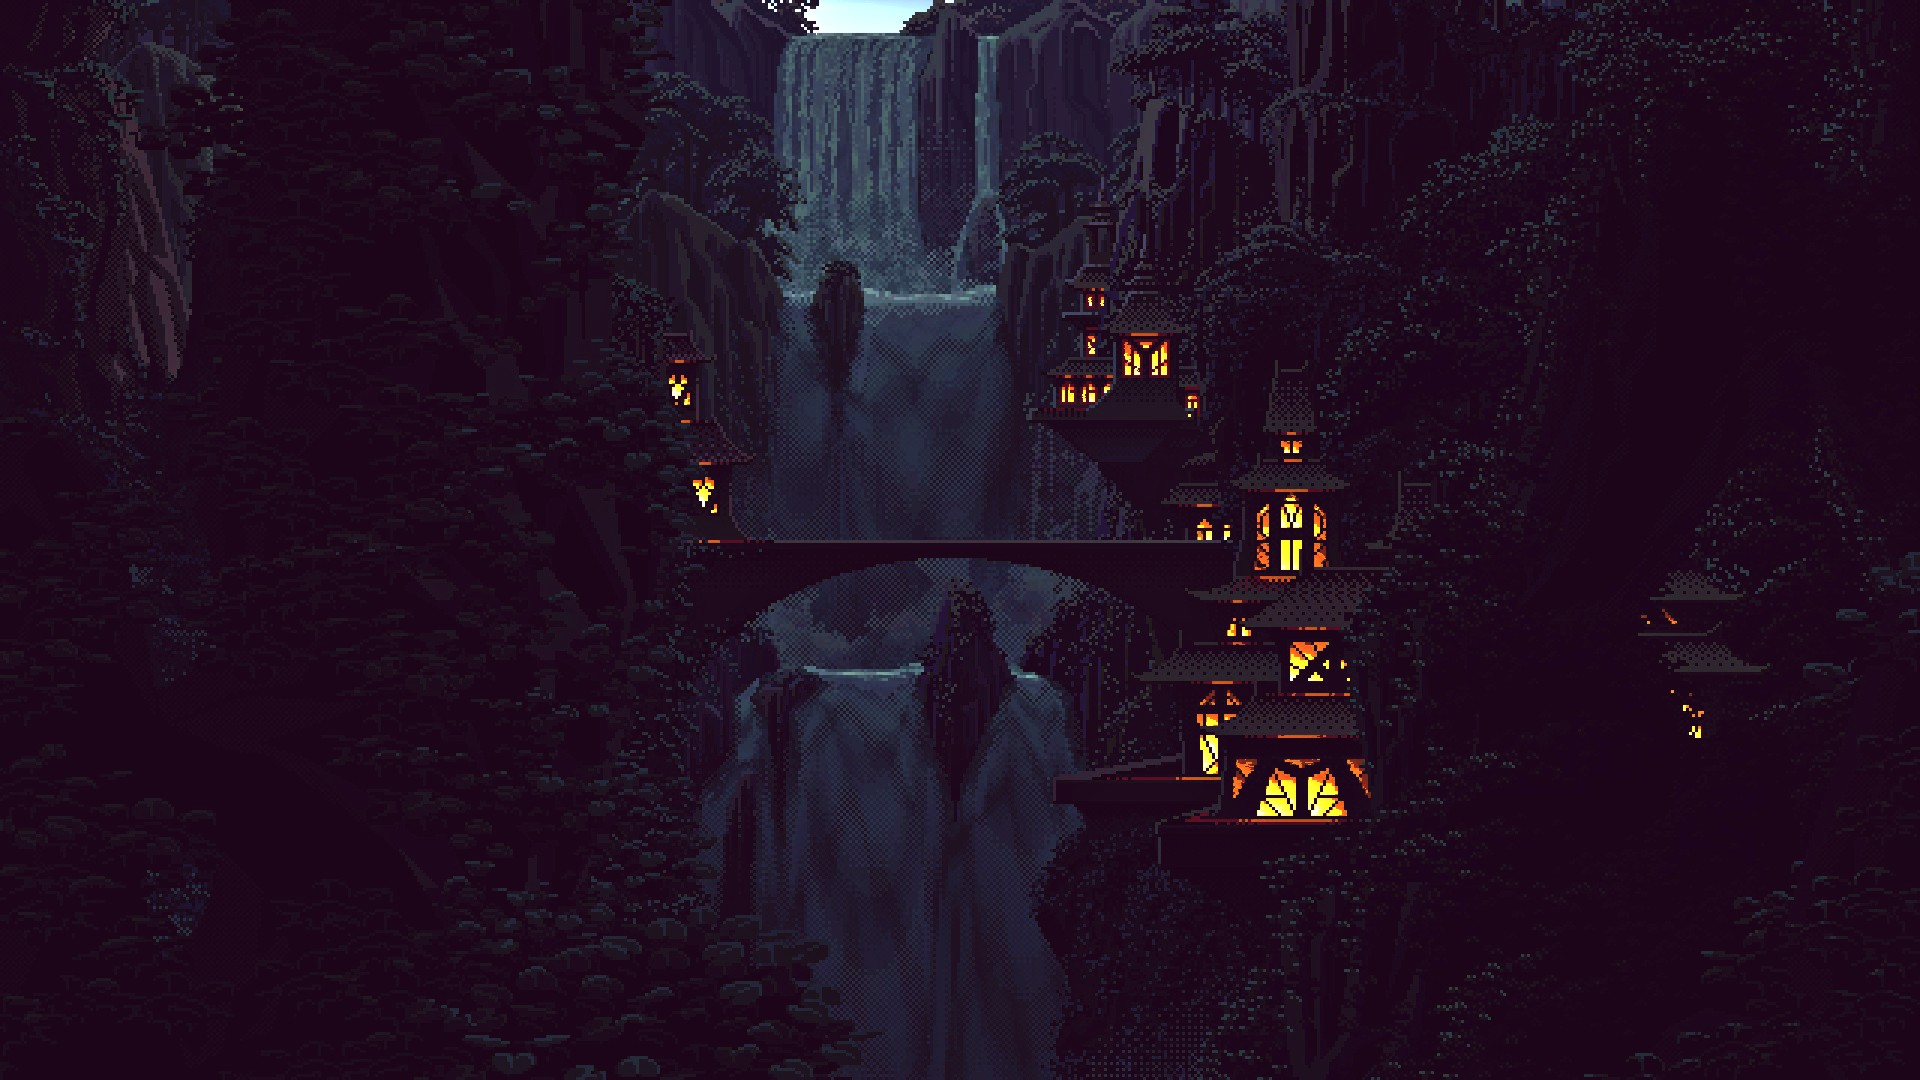 Pixel Landscape Background Tumblr Download Free Full HD Wallpapers For Desktop Mobile